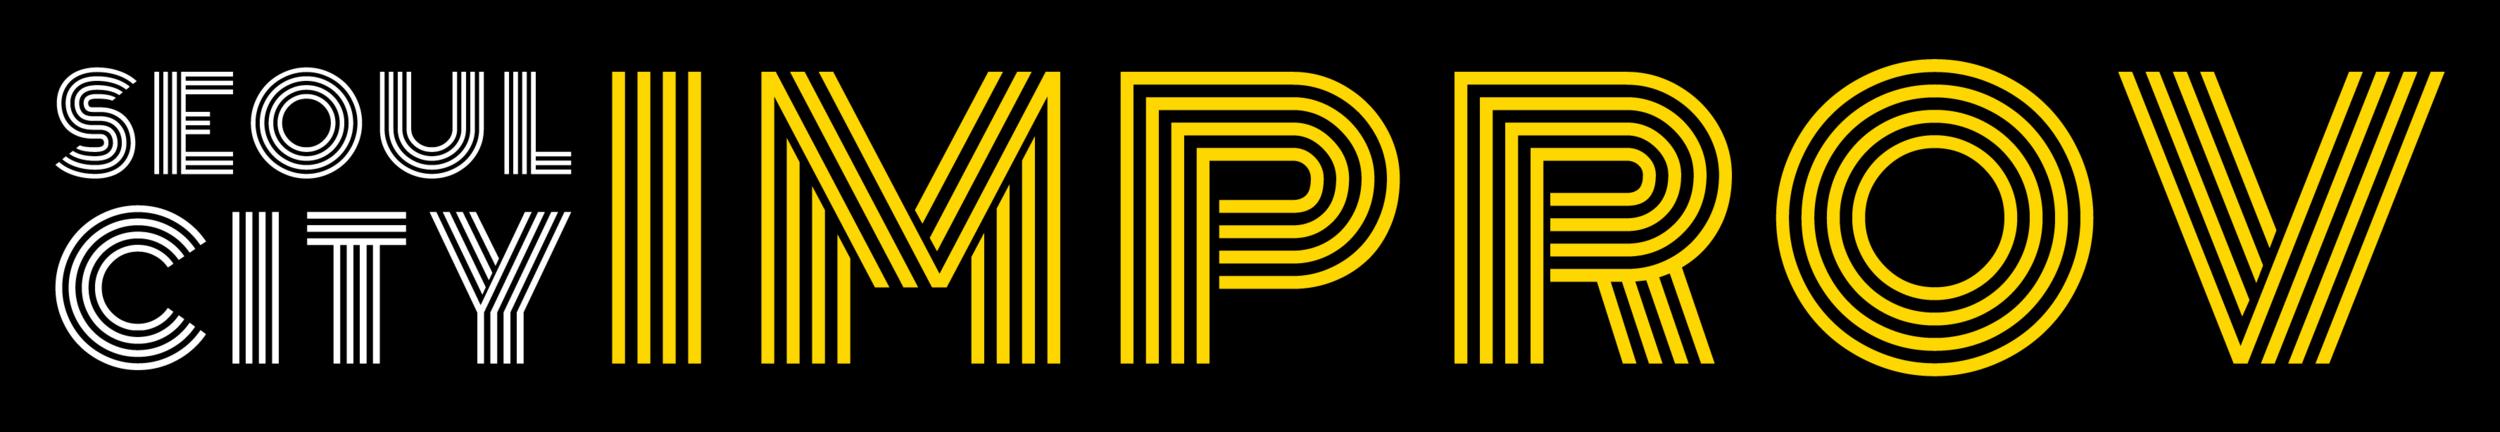 Seoul City Improv Logo Full Primary MAIN.png